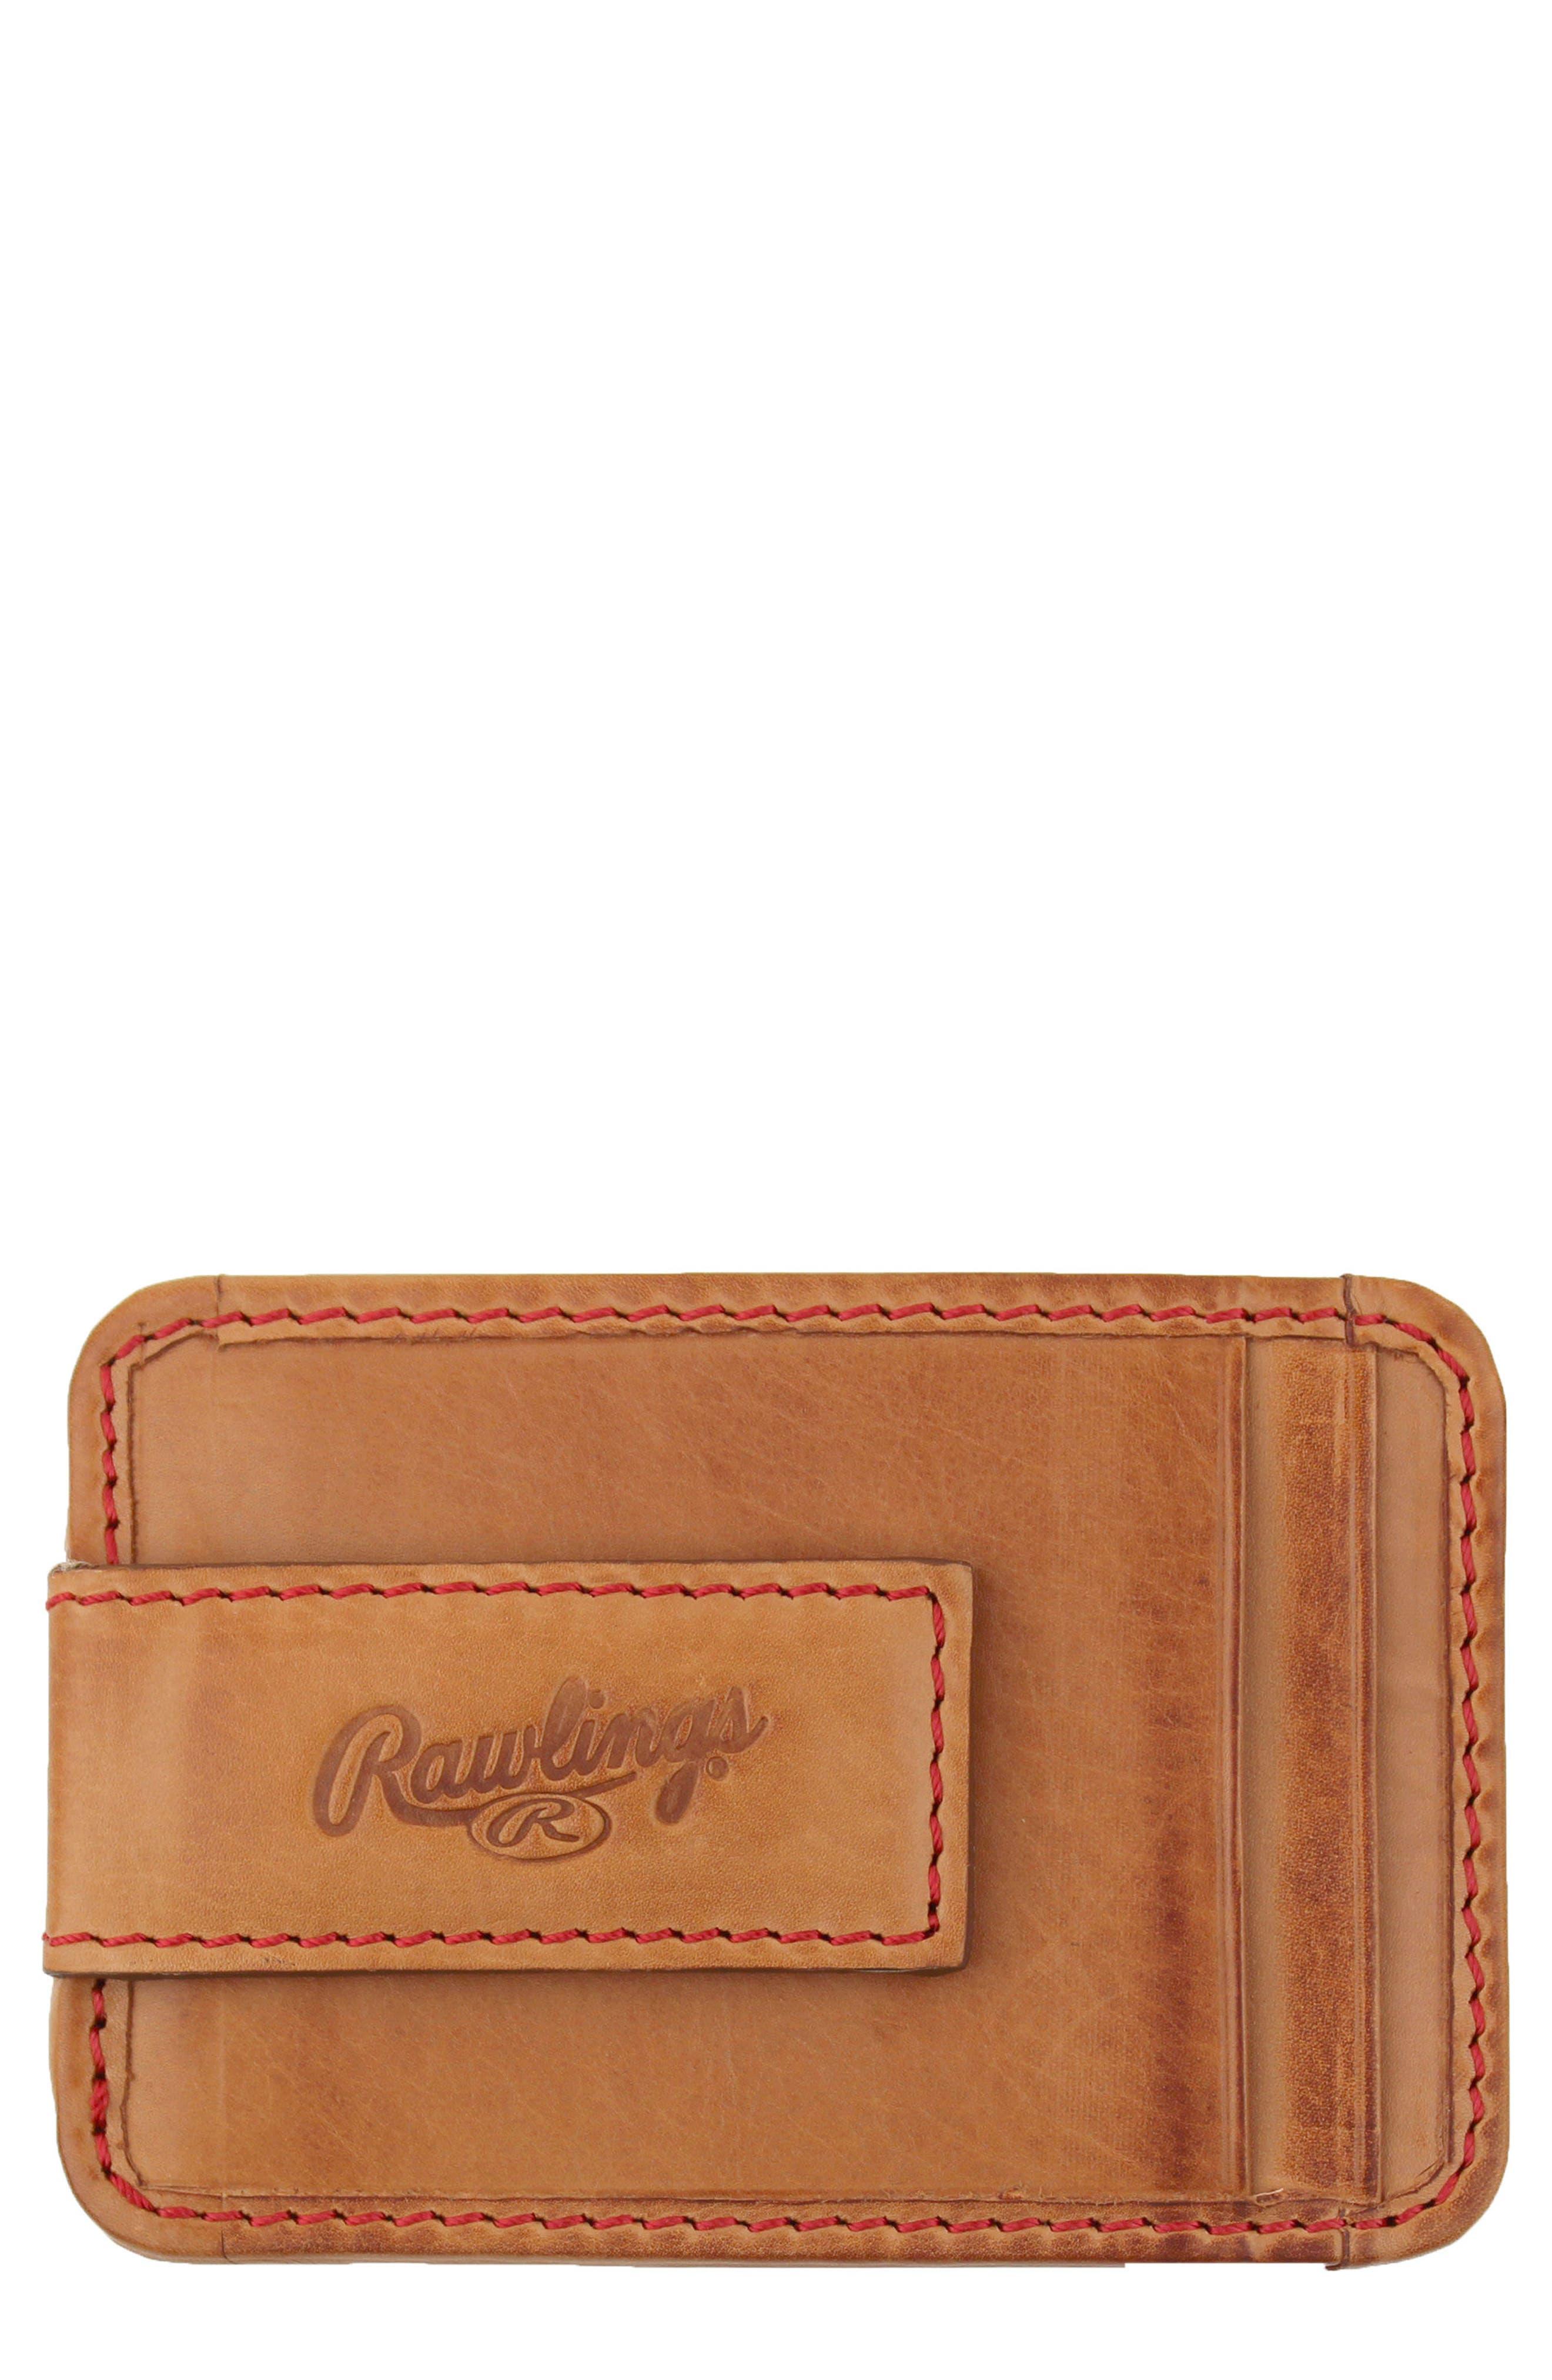 Baseball Stitch Money Clip Card Case,                         Main,                         color, Tan